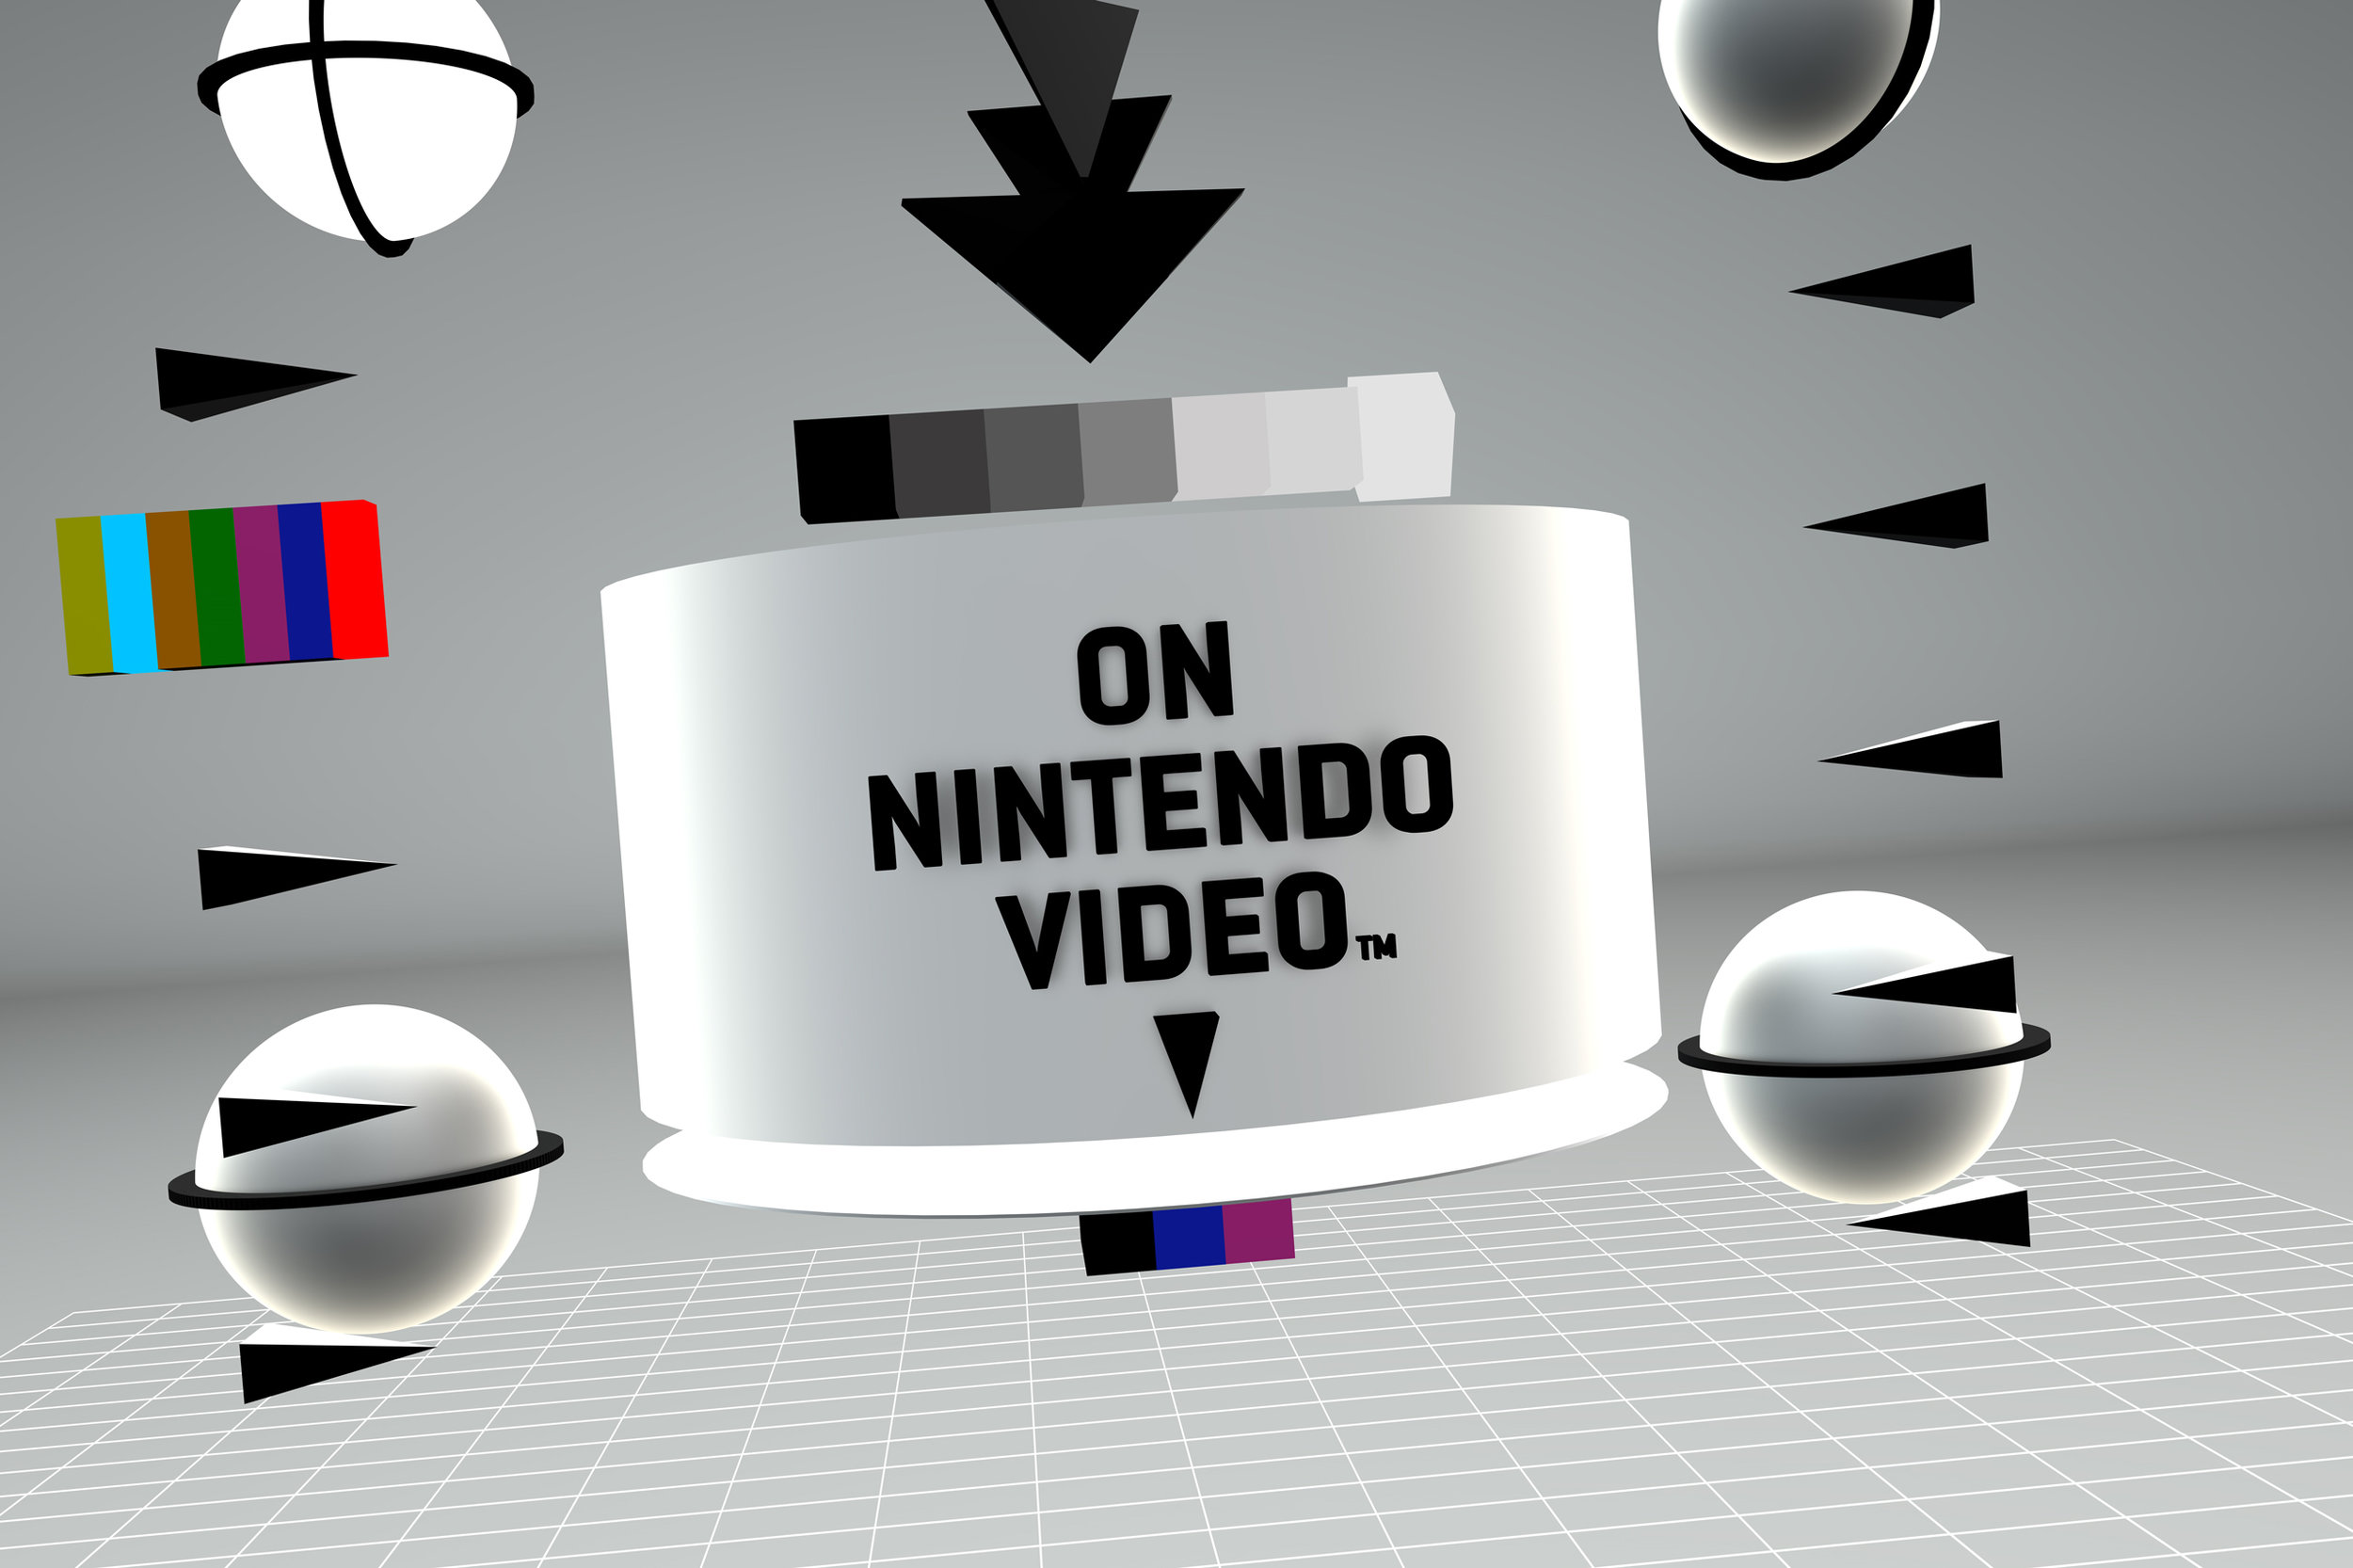 Nintendo_02.jpg